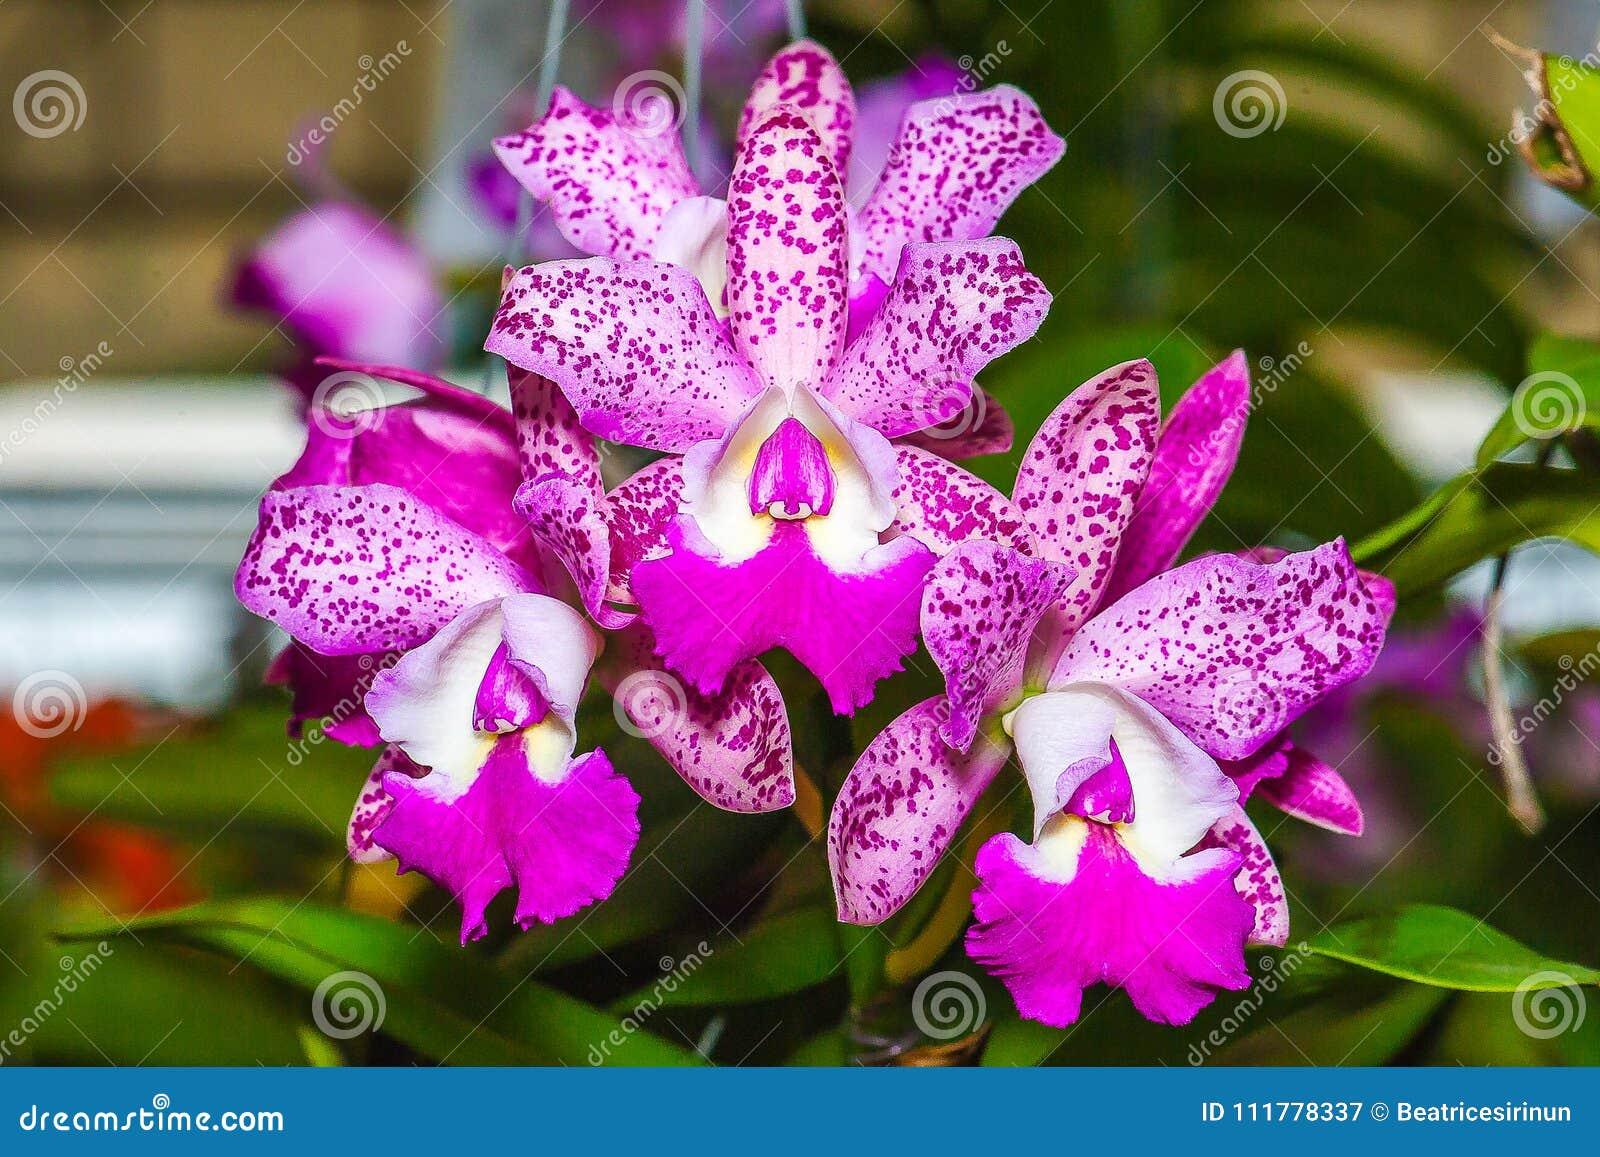 Cattleya Pink Jaguar - Orchid Hybrid.